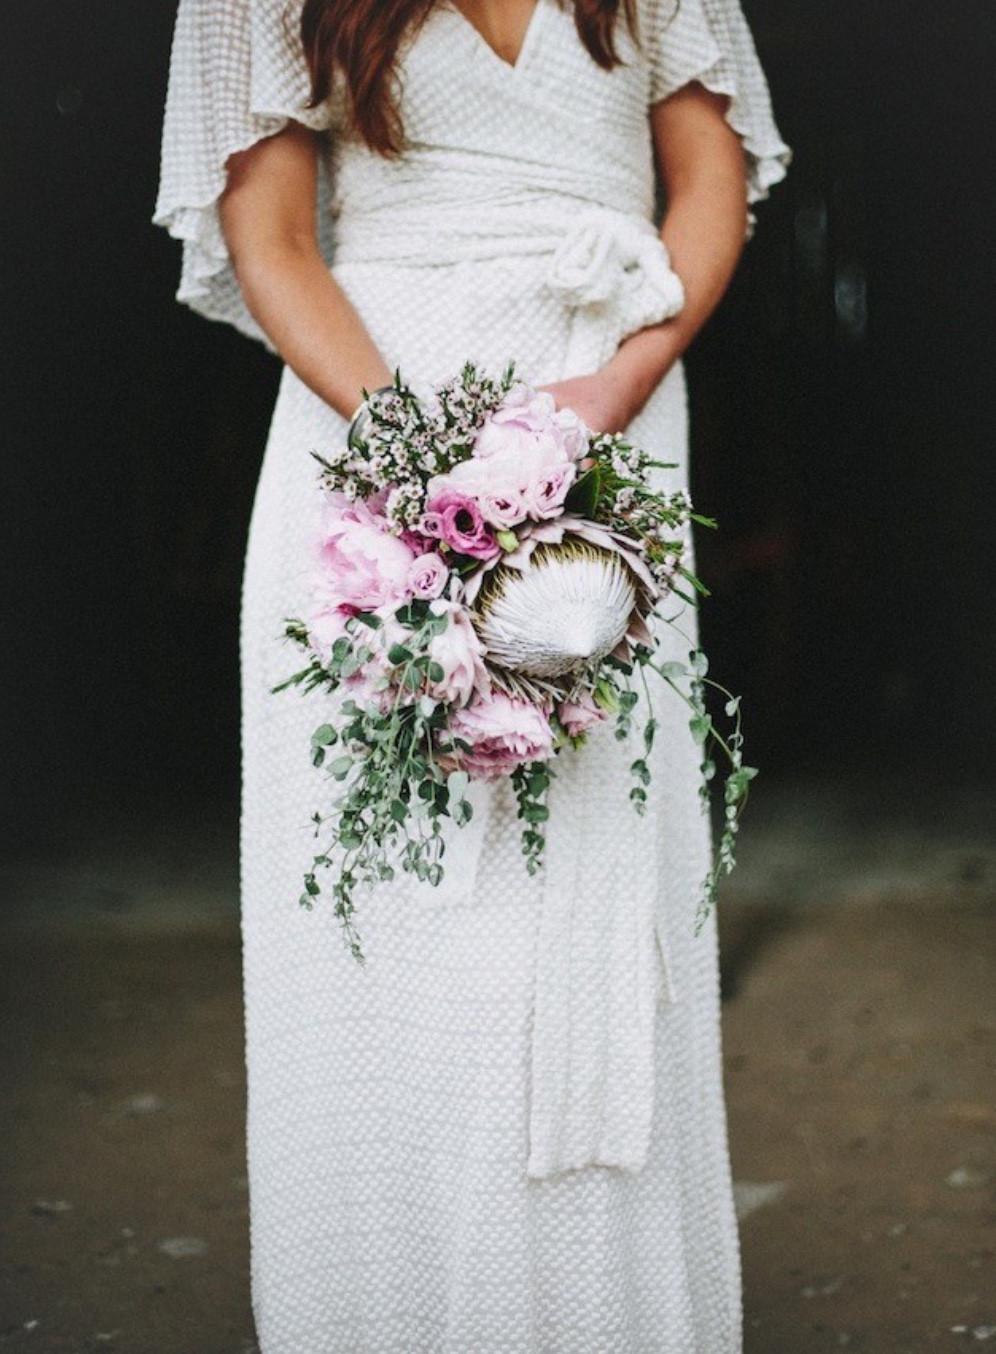 Clementine Posy Bouquet